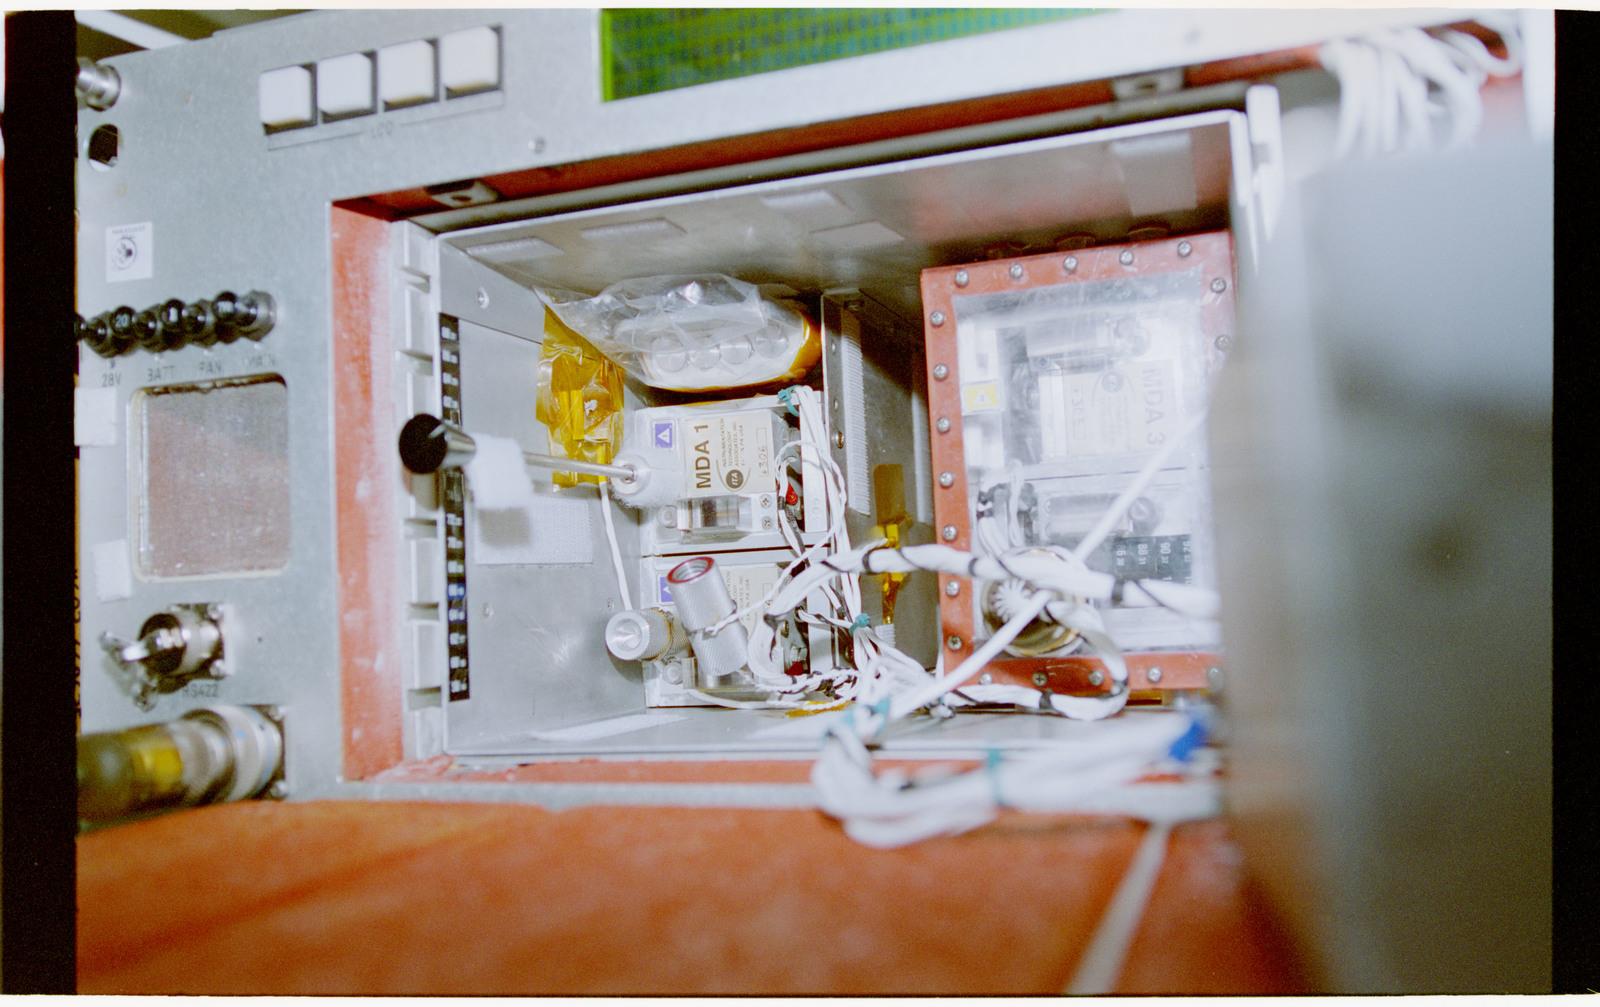 STS069-377-019 - STS-069 - CMIX-04